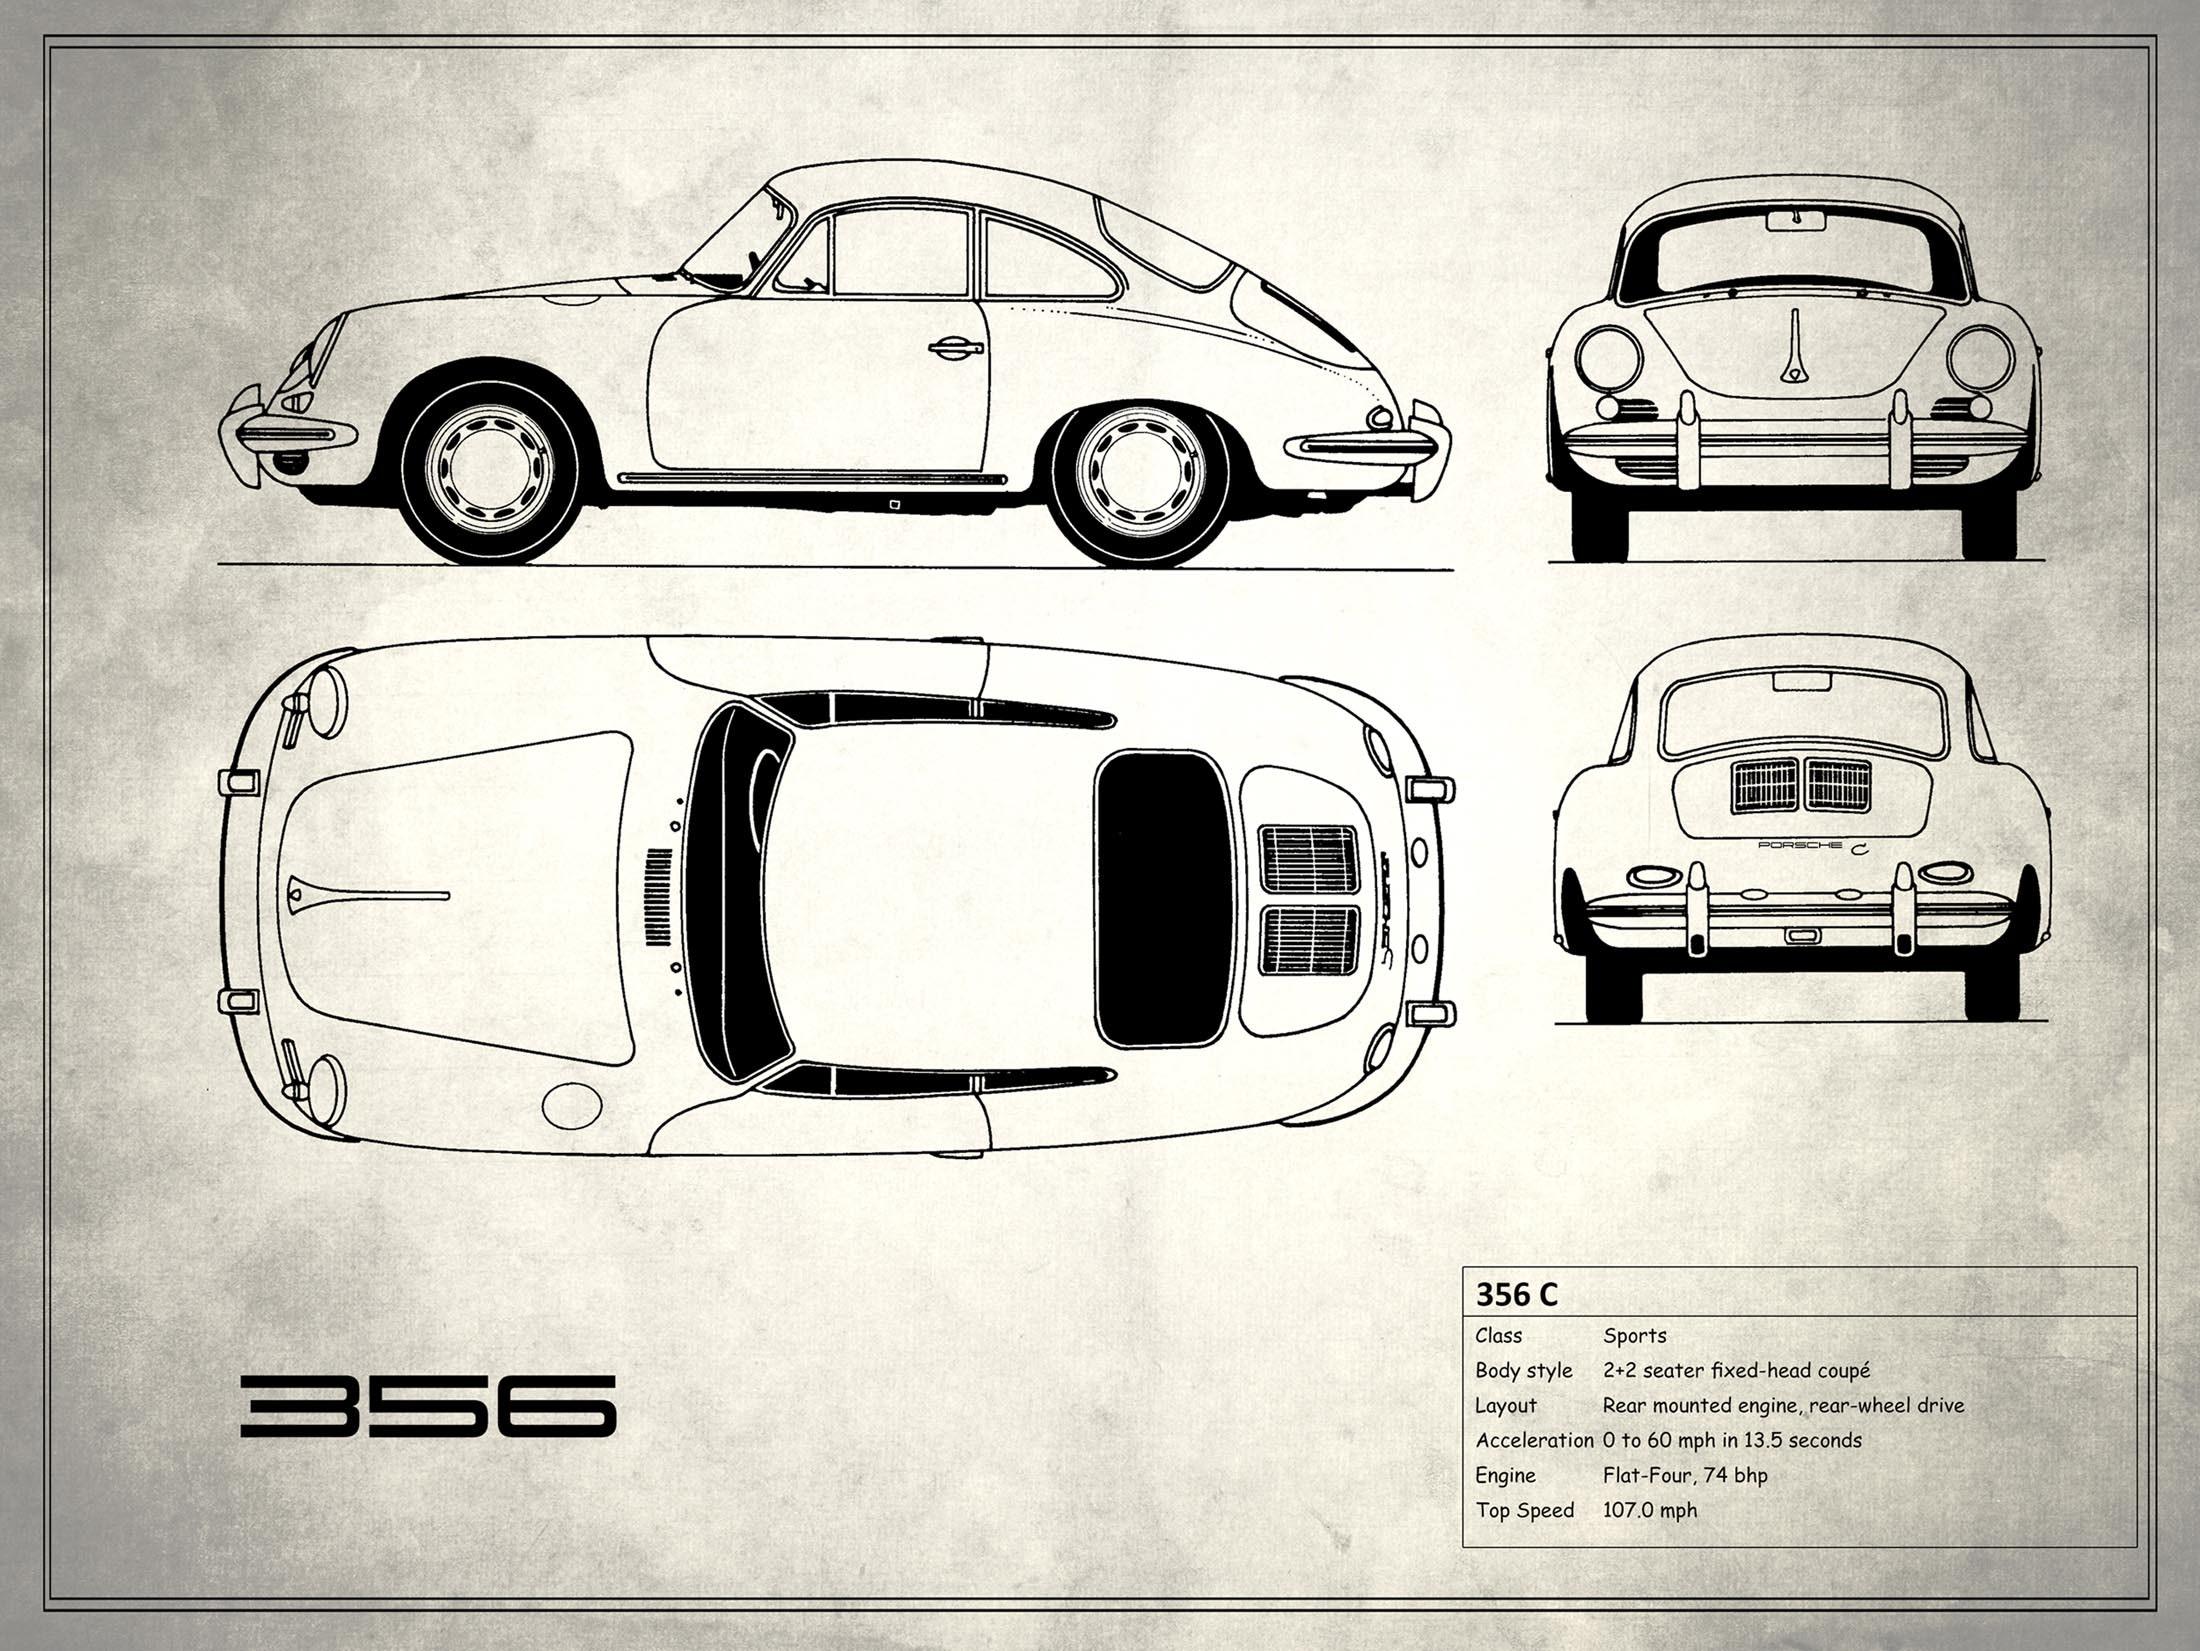 Porsche 356 C - White